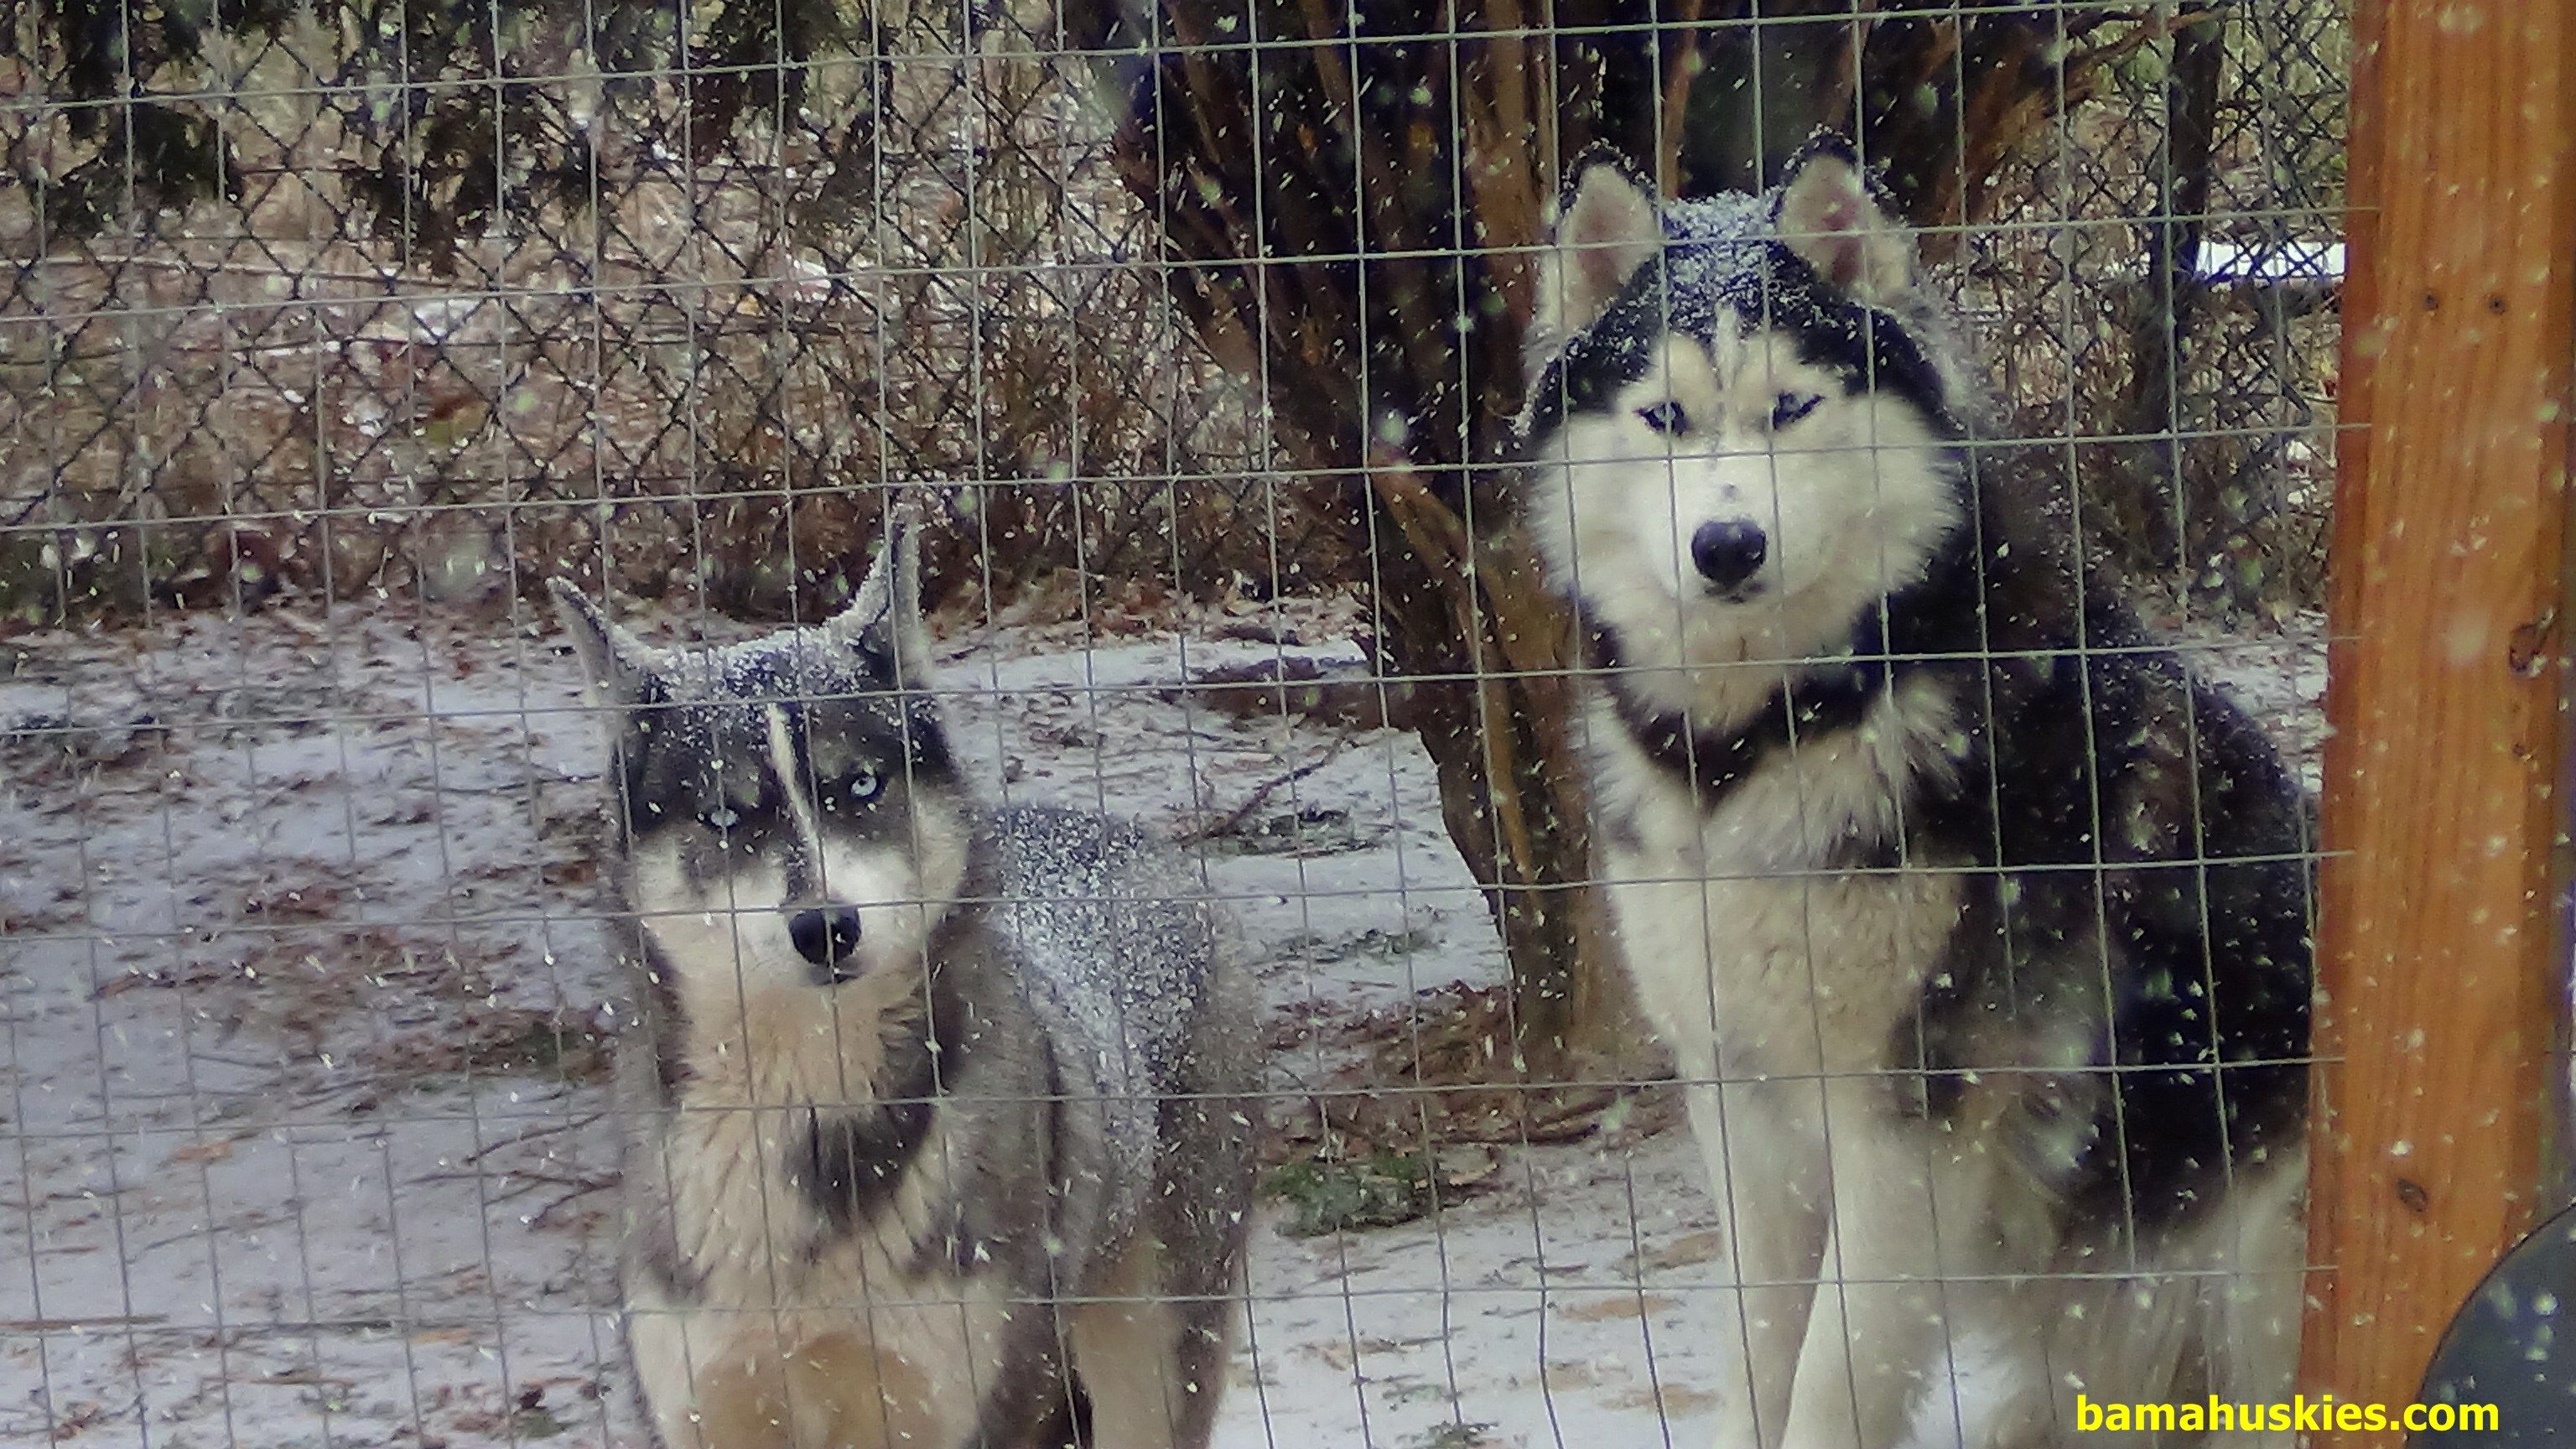 Alabama Huskies Enjoying The Snow Bama Huskies Husky Husky